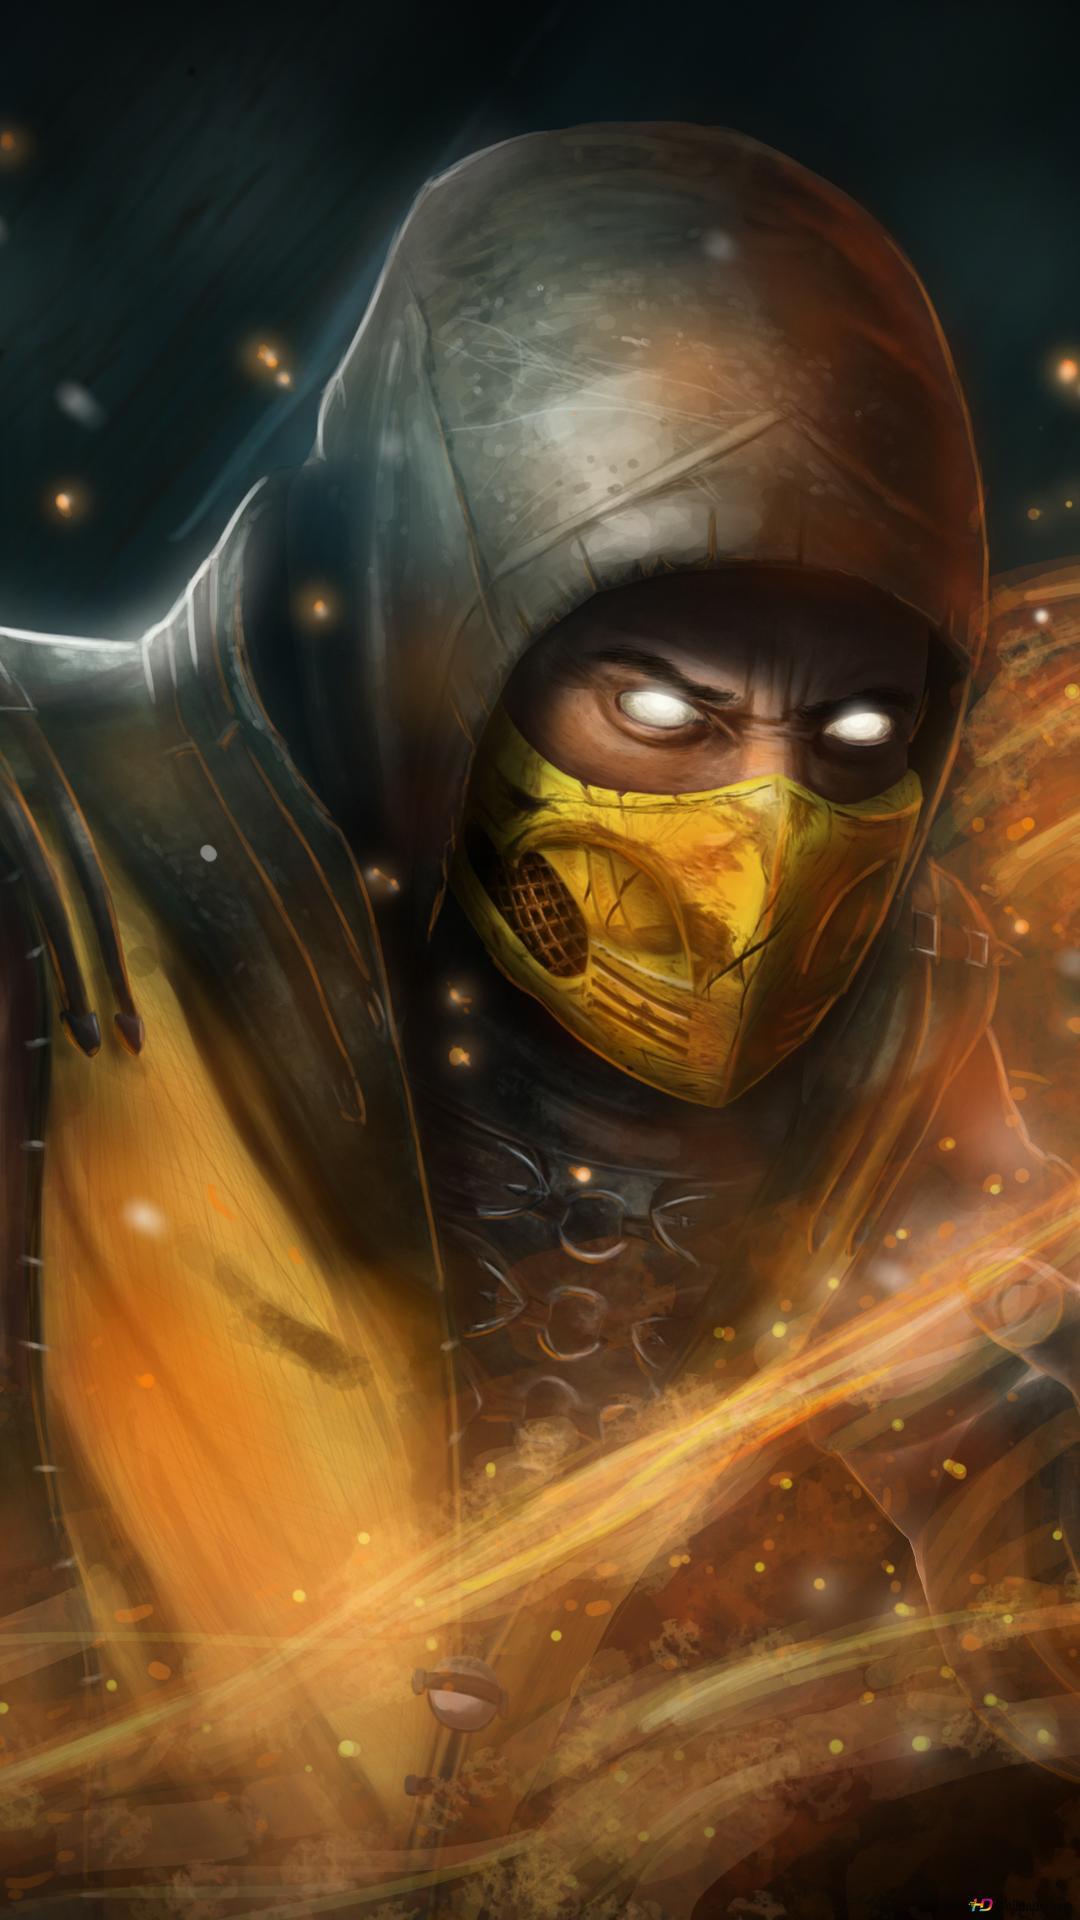 Mortal Kombat 11 2019 Scorpion Digital Art Hd Wallpaper Download